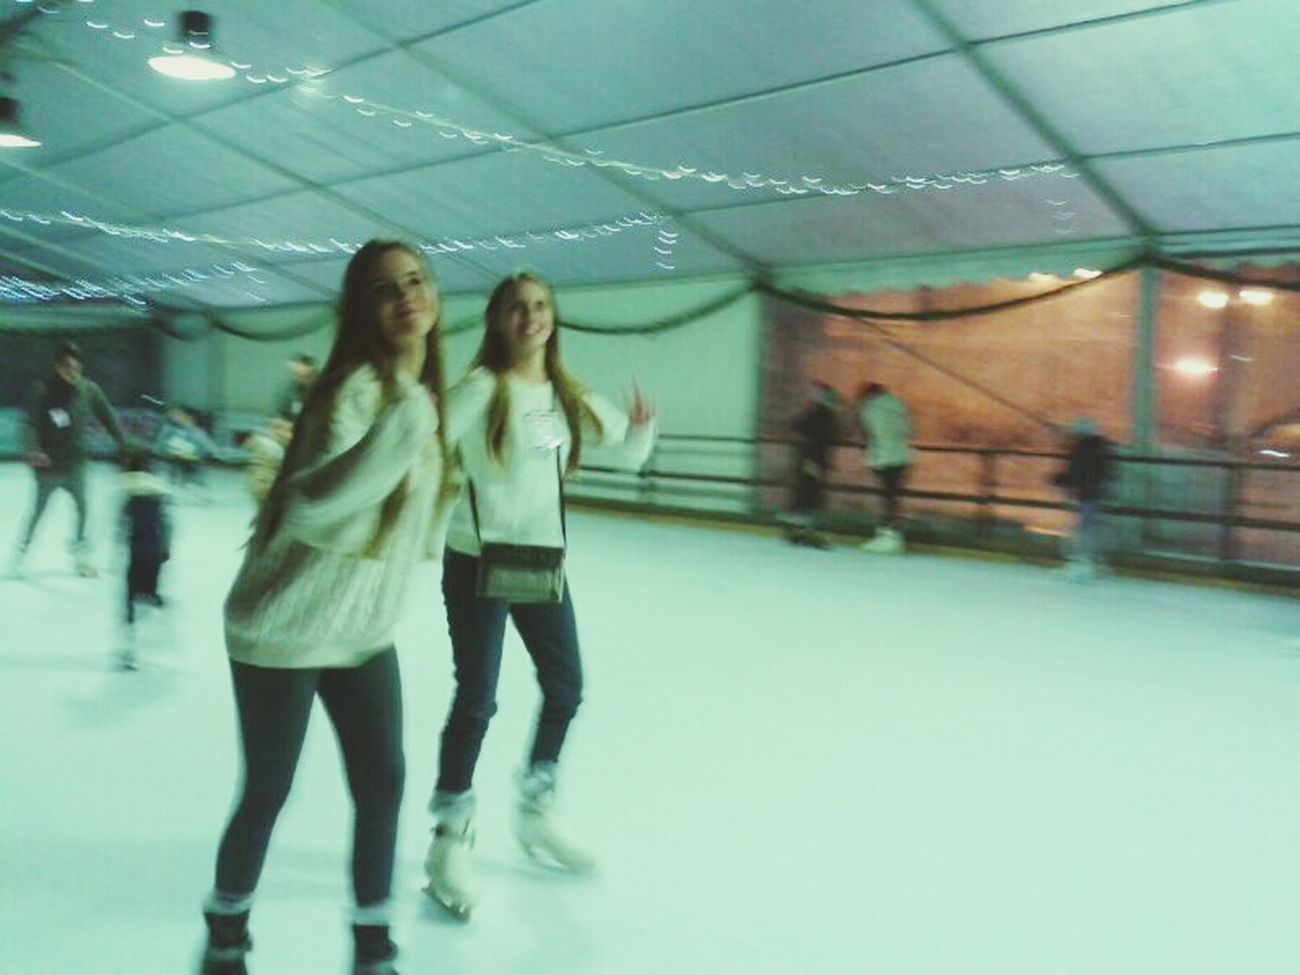 Sorelle Boni sul ghiaccio :3